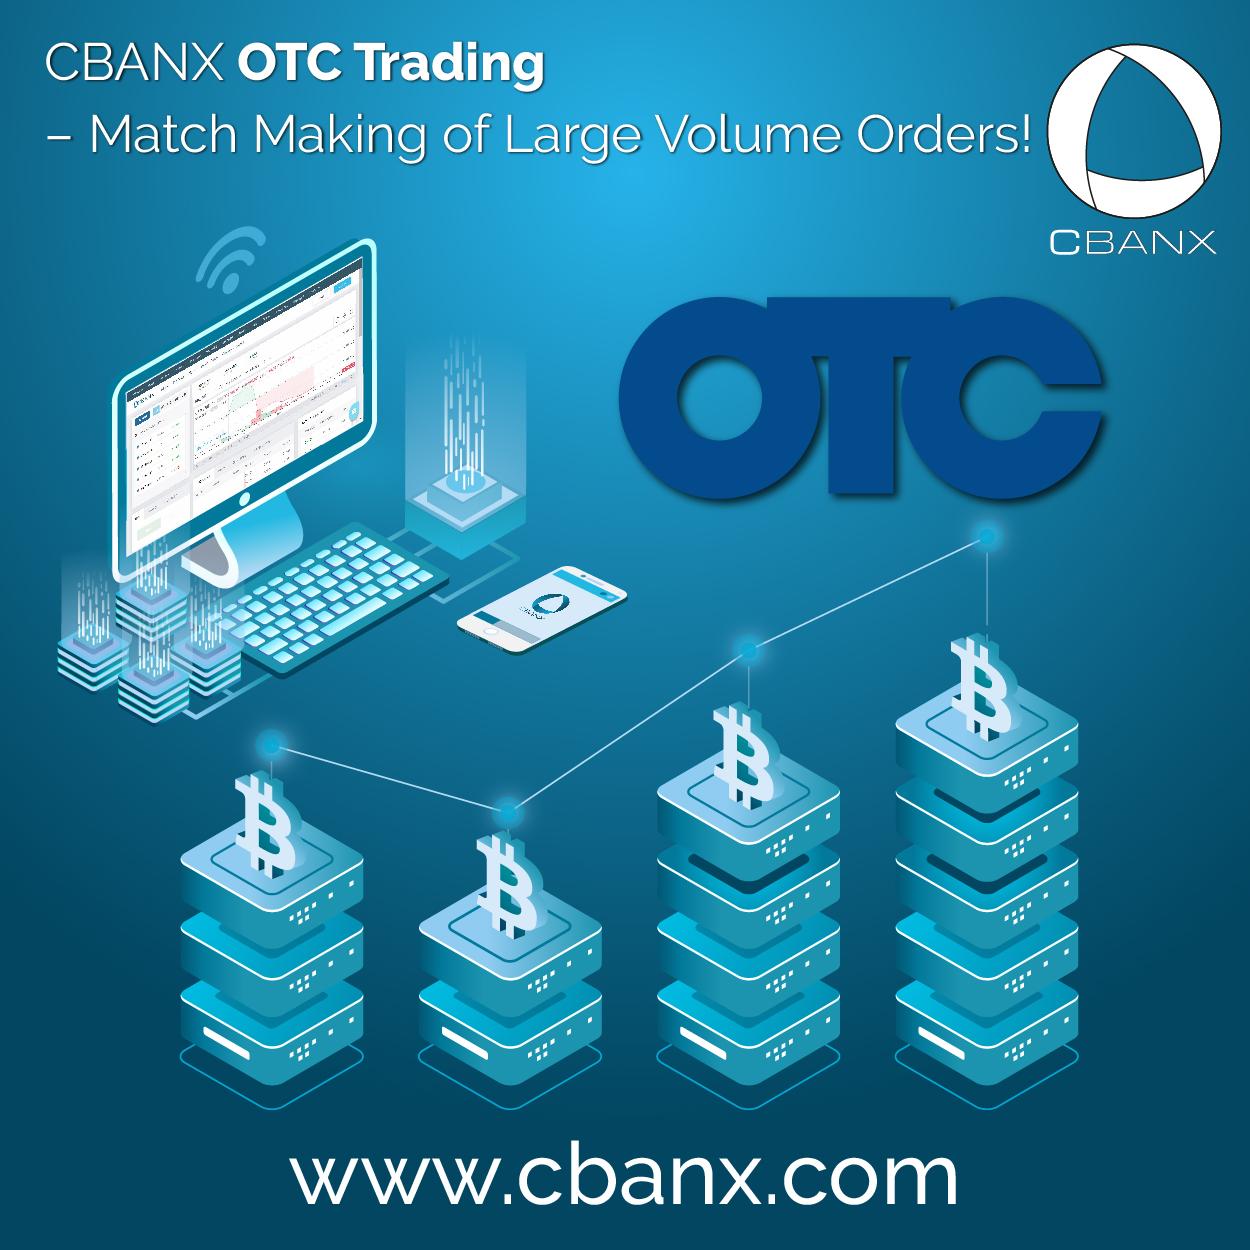 CBANX OTC Trading – Match Making of Large Volume Orders!